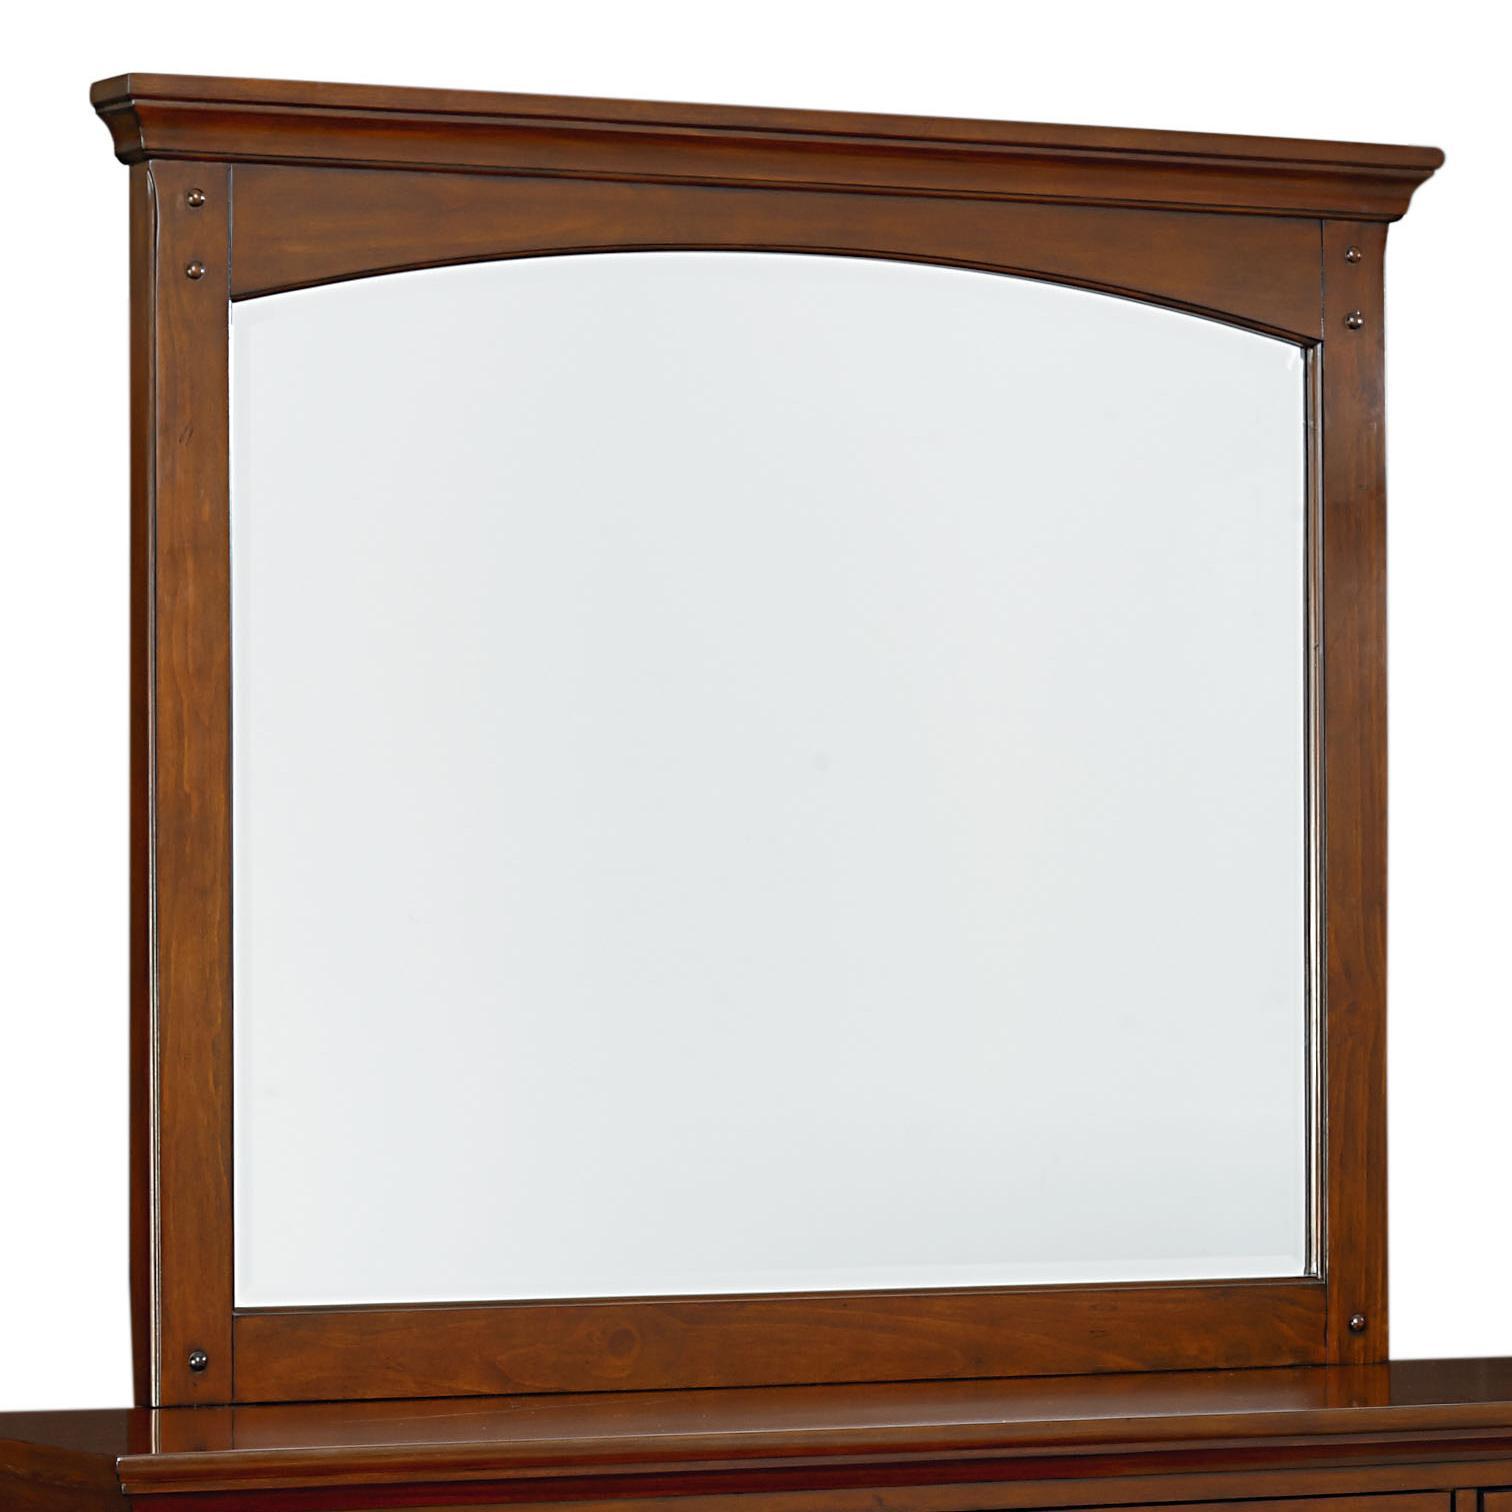 Standard Furniture Cooperstown Mirror - Item Number: 93808